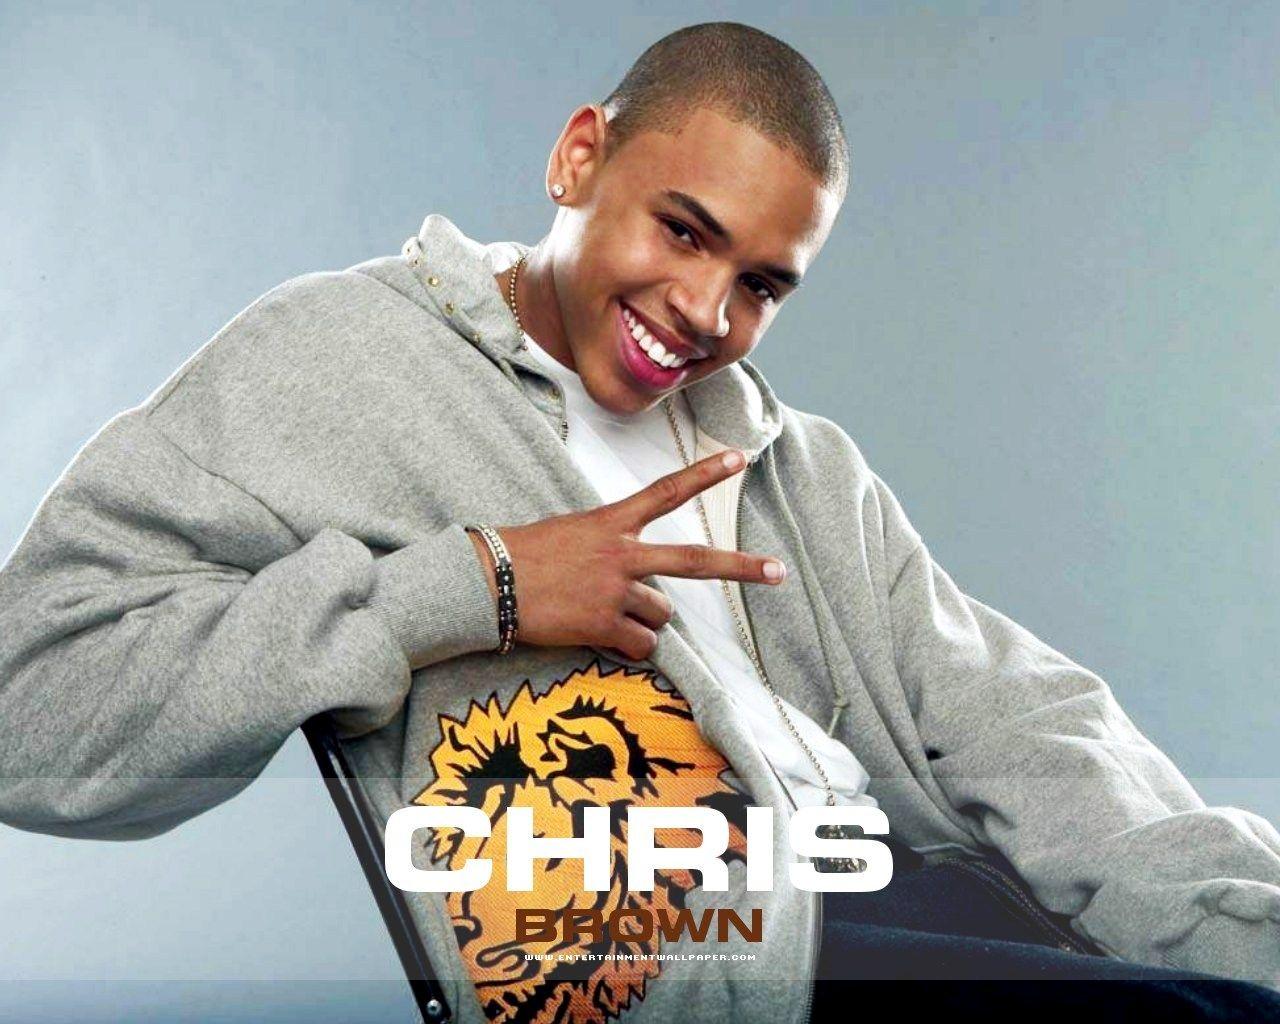 Chris Brown Wallpaper HD